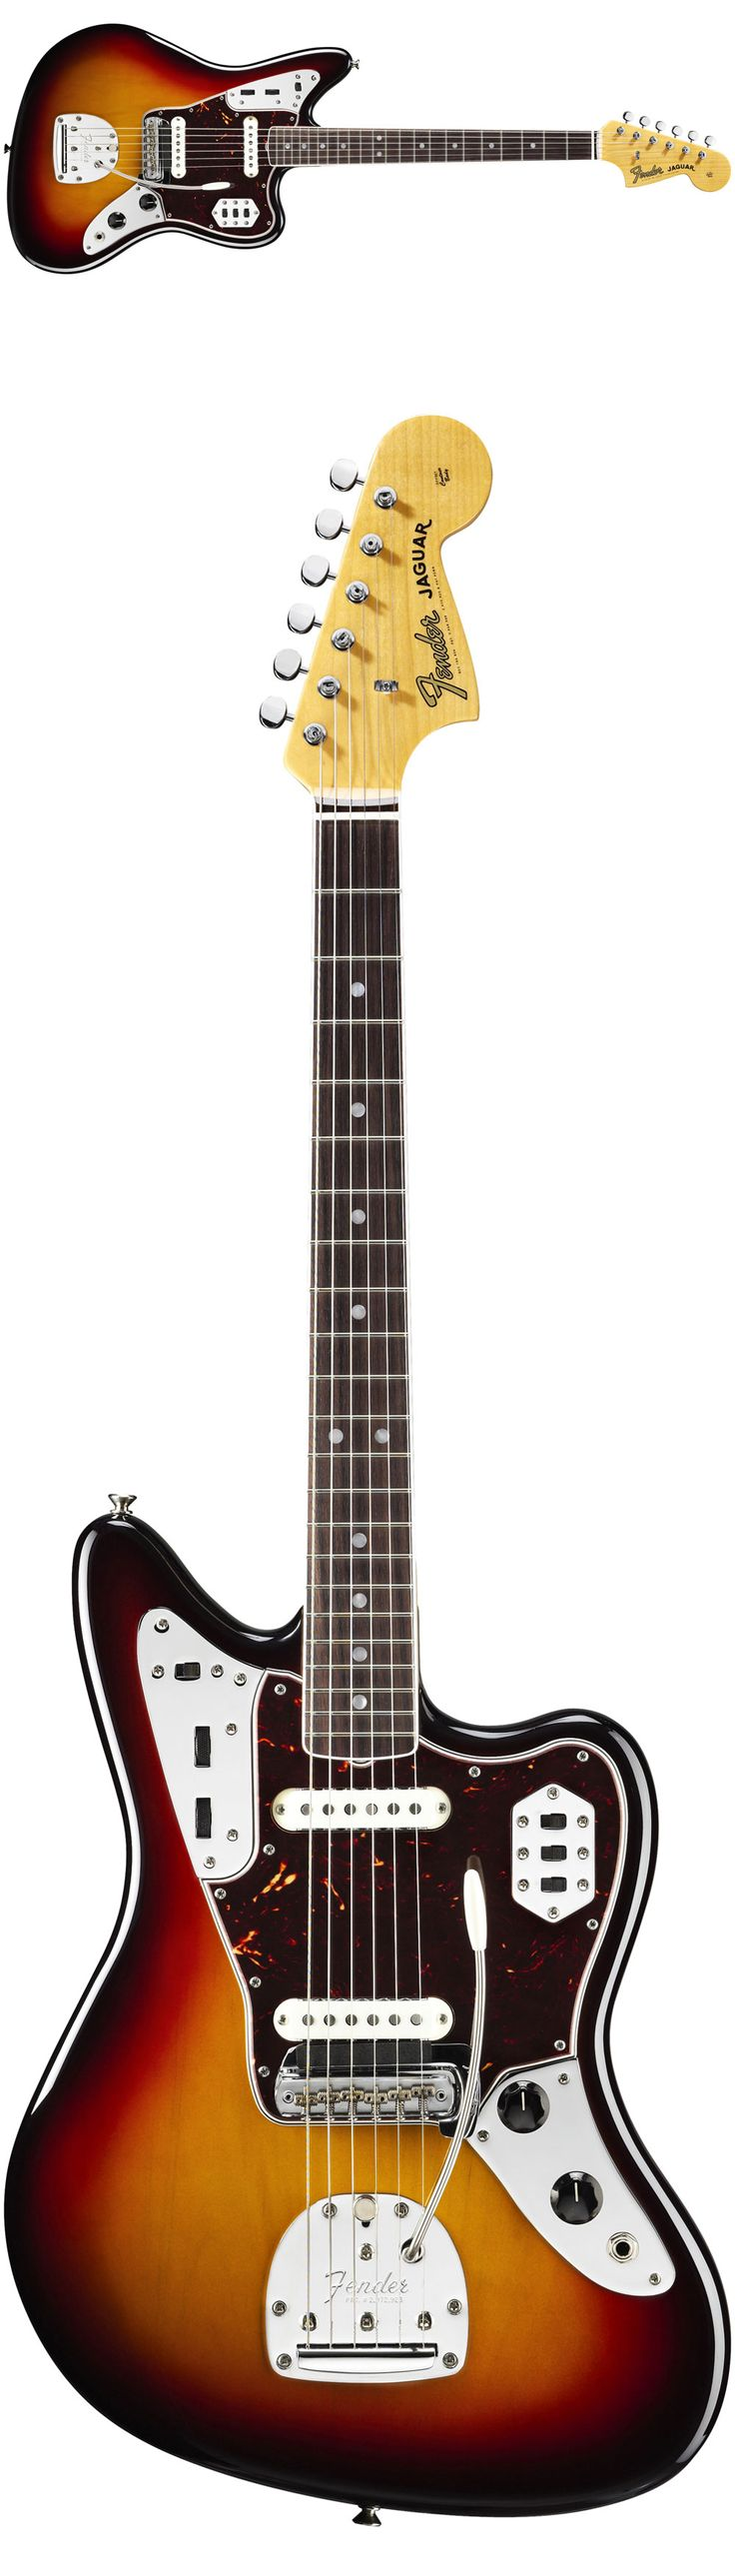 Fender American Vintage '65 Jaguar Electric Guitar The American Vintage '65 Jaguar marks a key chapter in Jaguar history. That is, after surf and before punk, when the sole '60s member of Fender's big